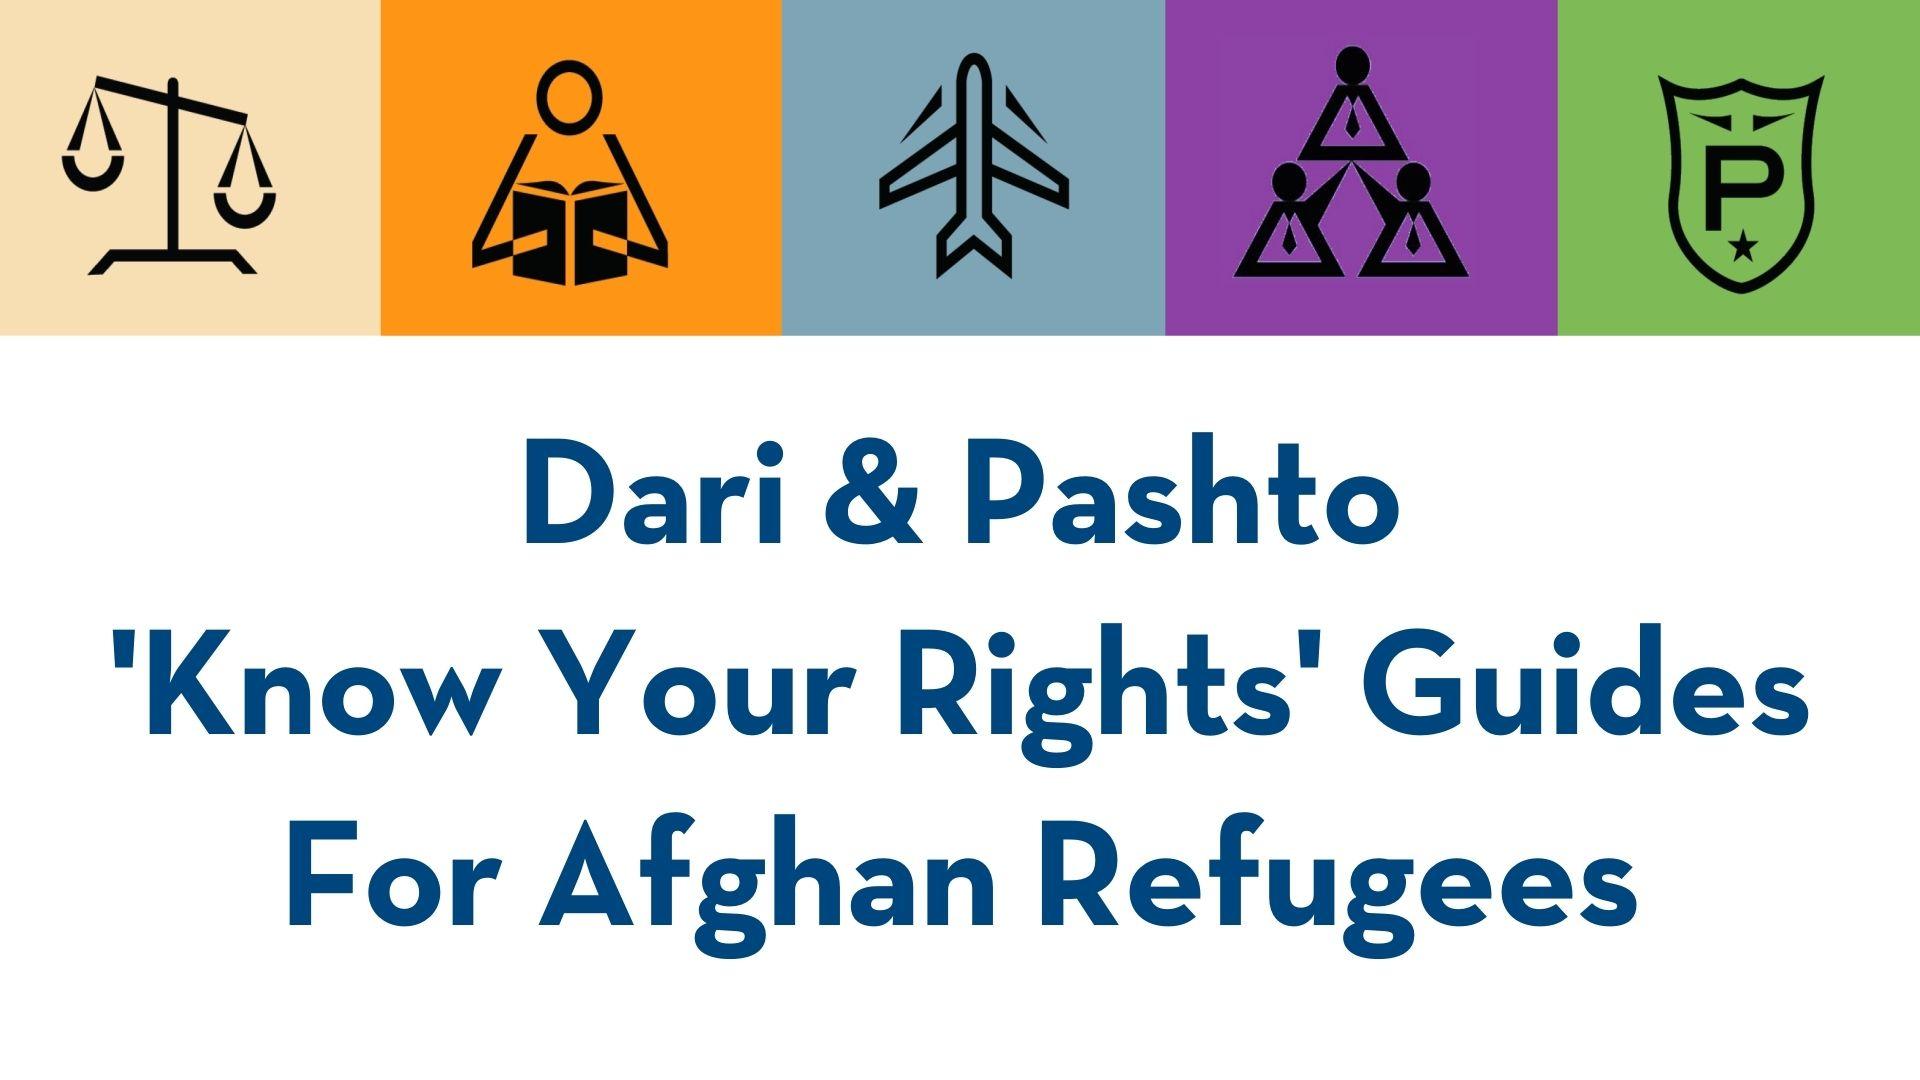 Dari & Pashto KYR Guides